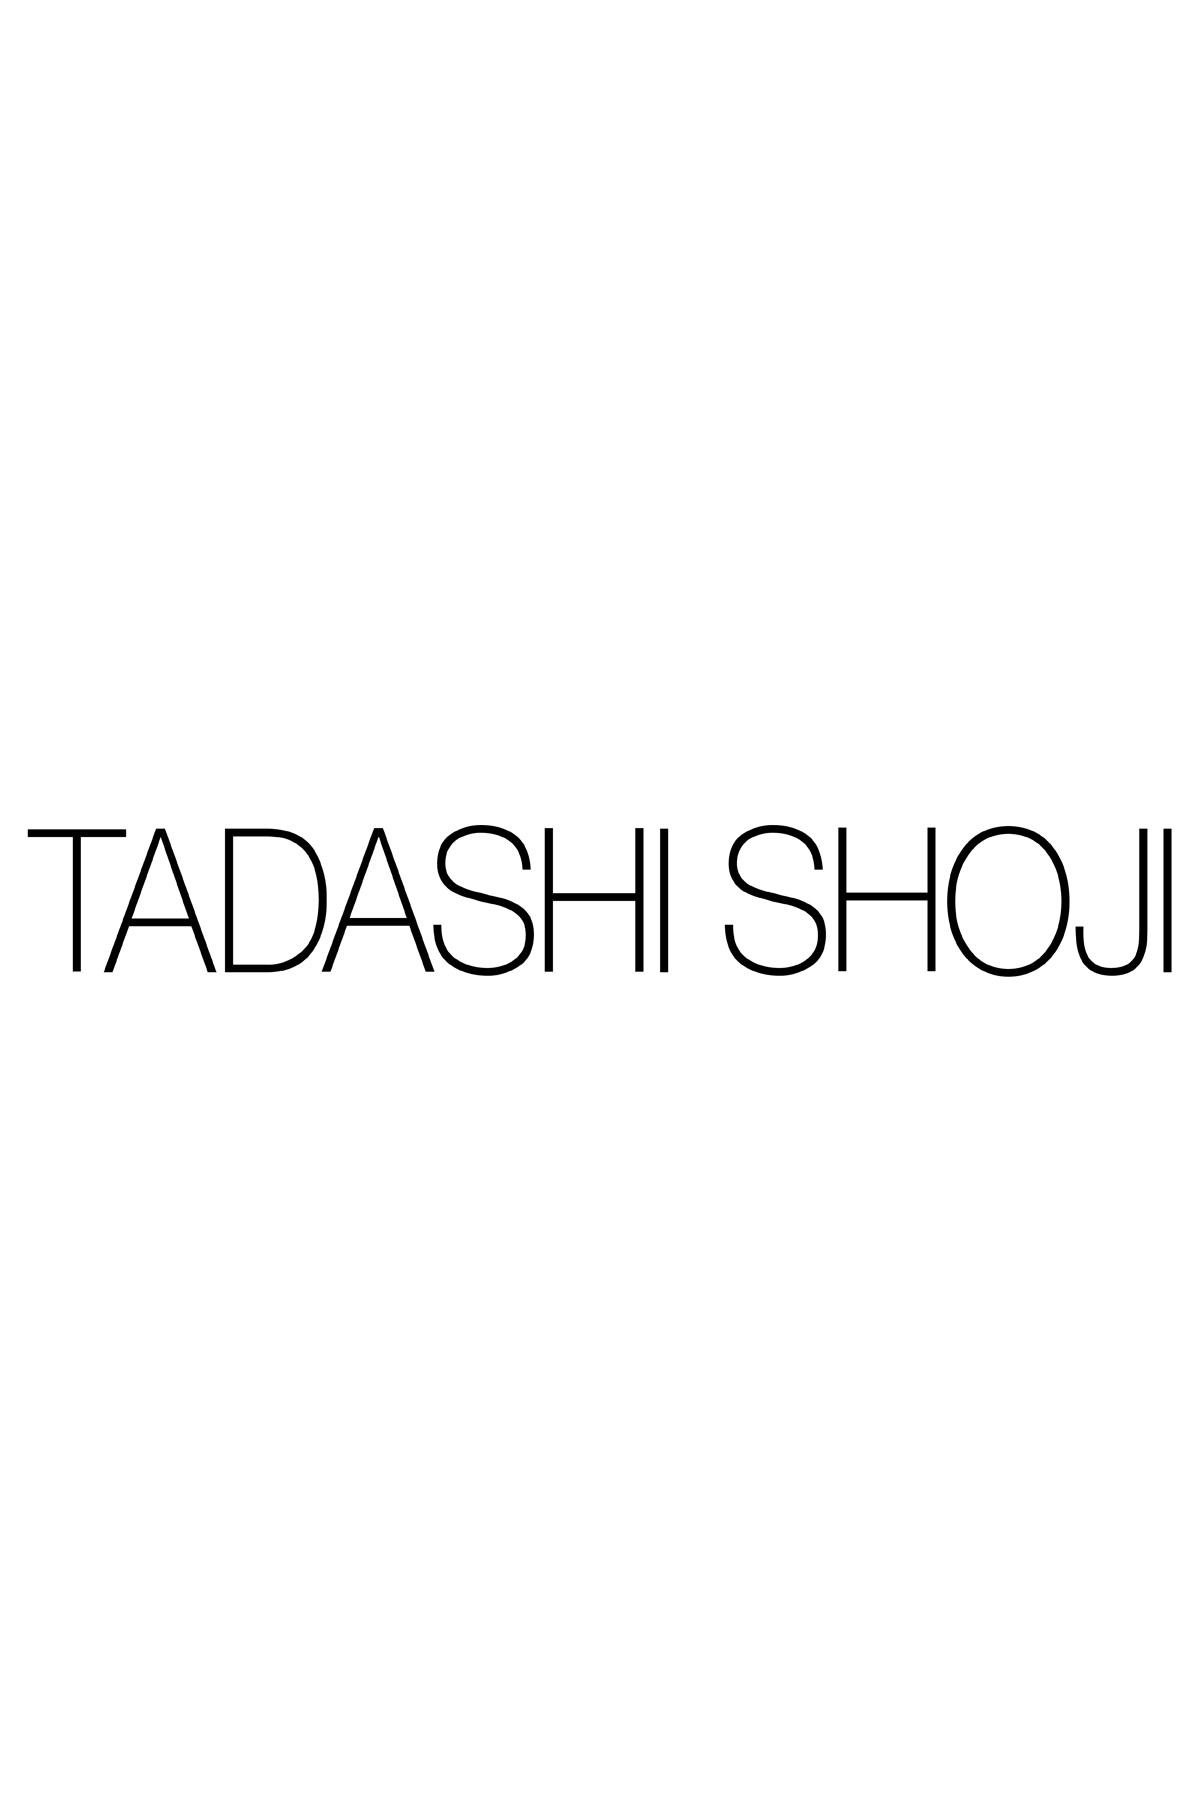 Chini Blouson Sequin Dress - PLUS SIZE | Tadashi Shoji